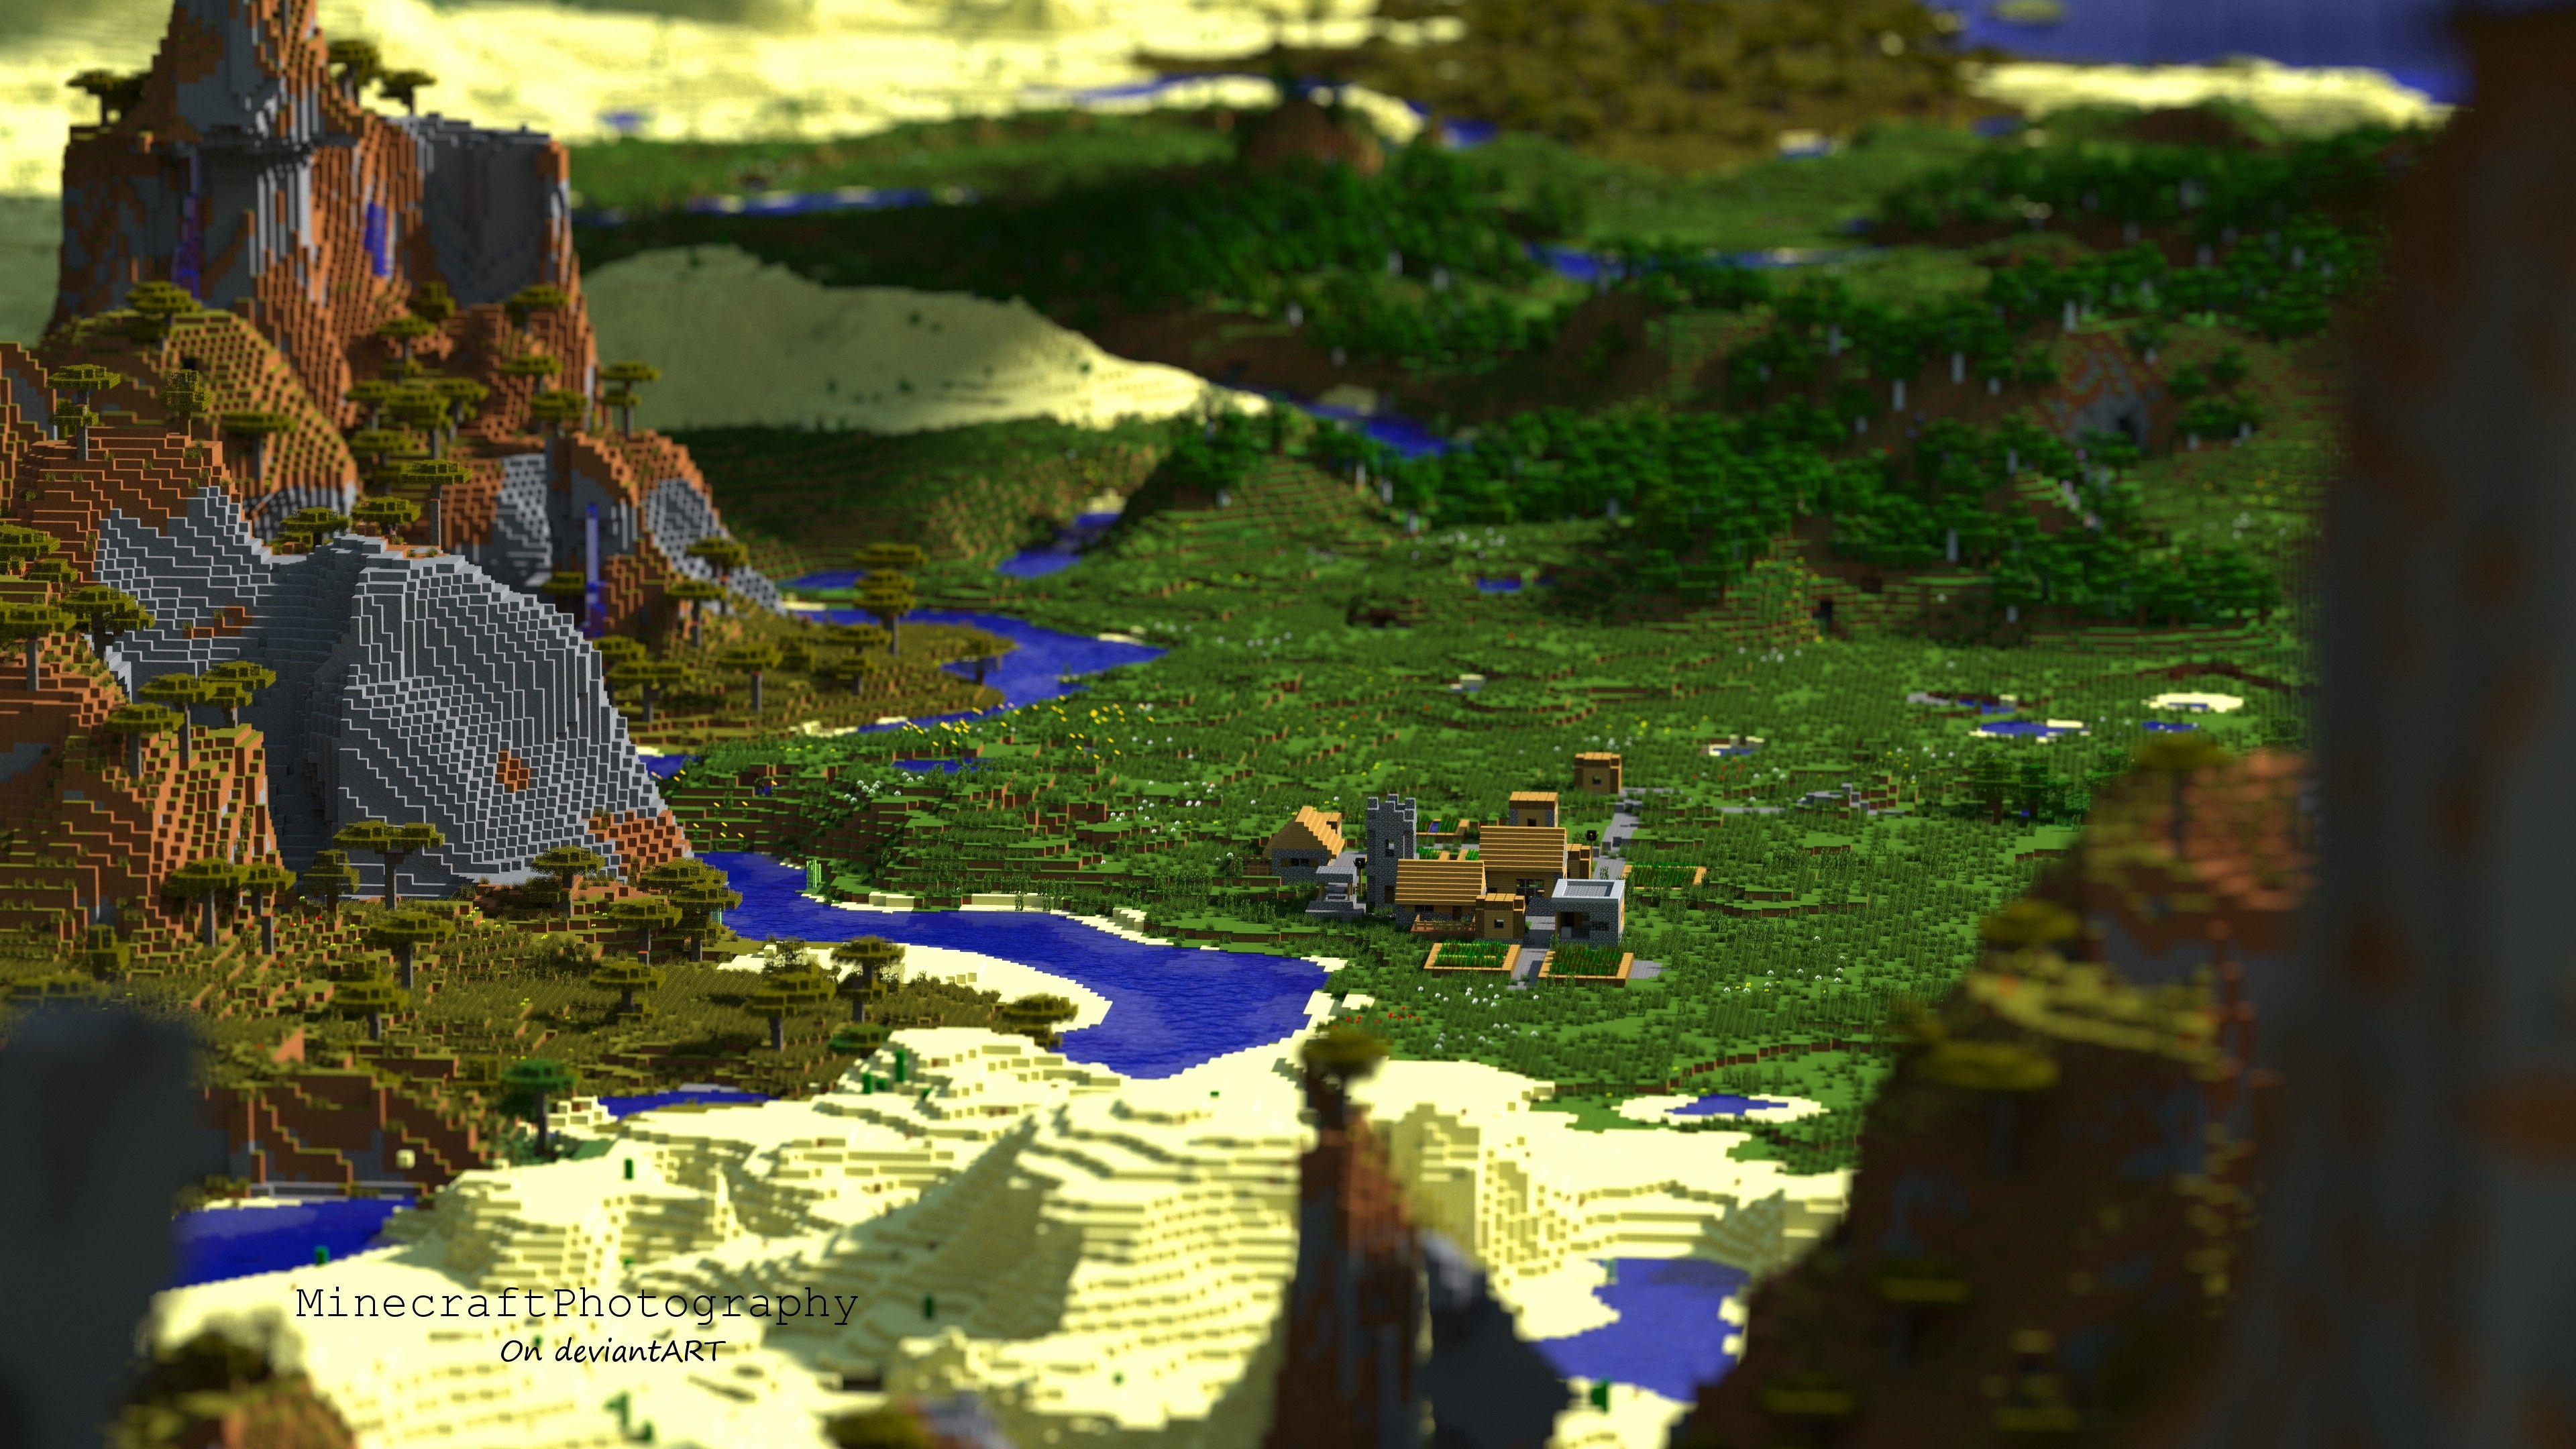 Cool Wallpaper Minecraft Steampunk - 97e0a8f0923aba6d862a081379fcd0b8  Pic_455482.jpg